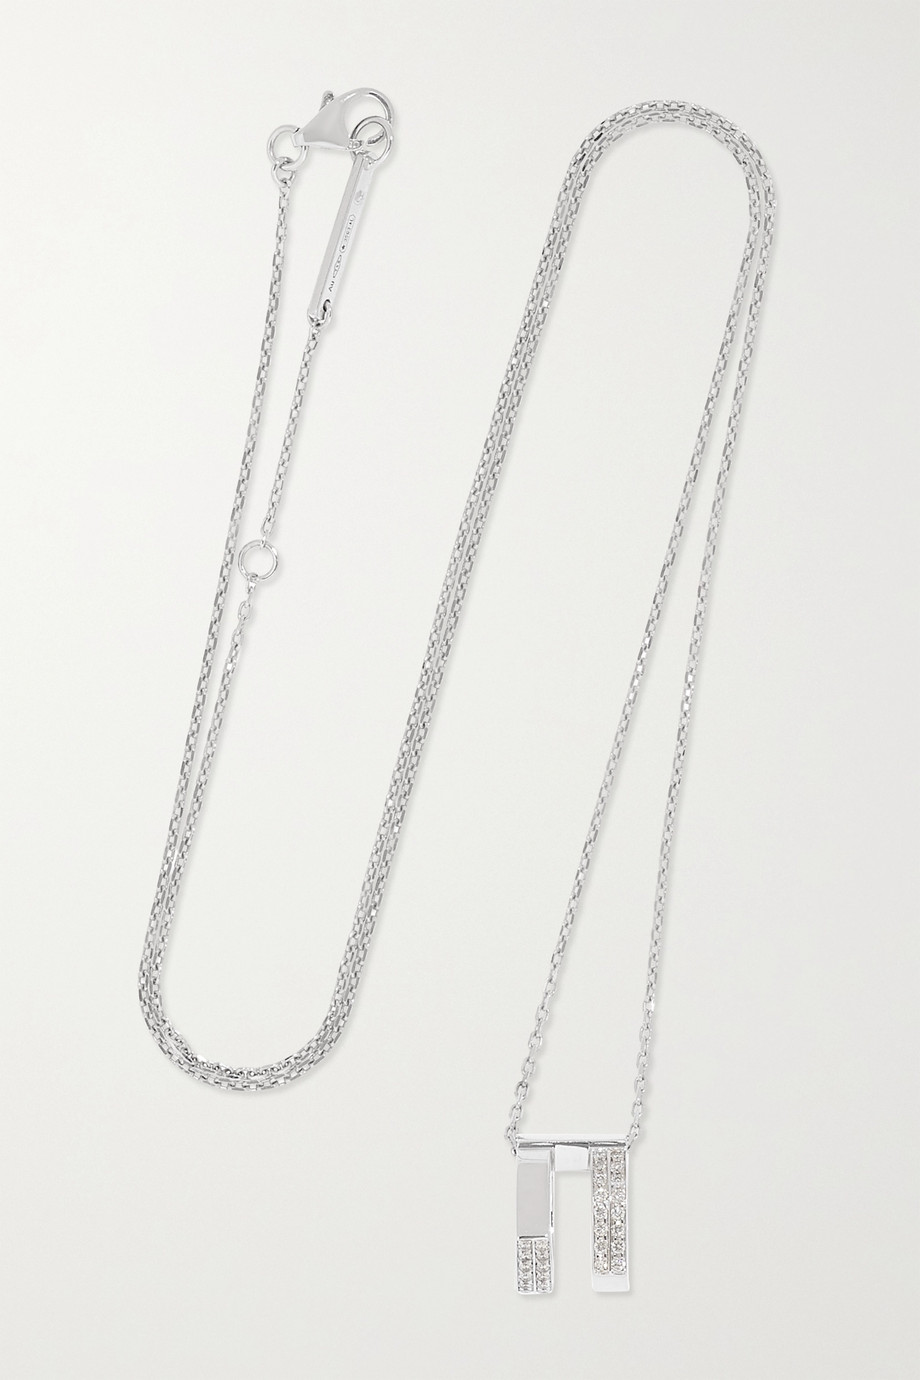 Repossi Antifer 18-karat white gold diamond necklace